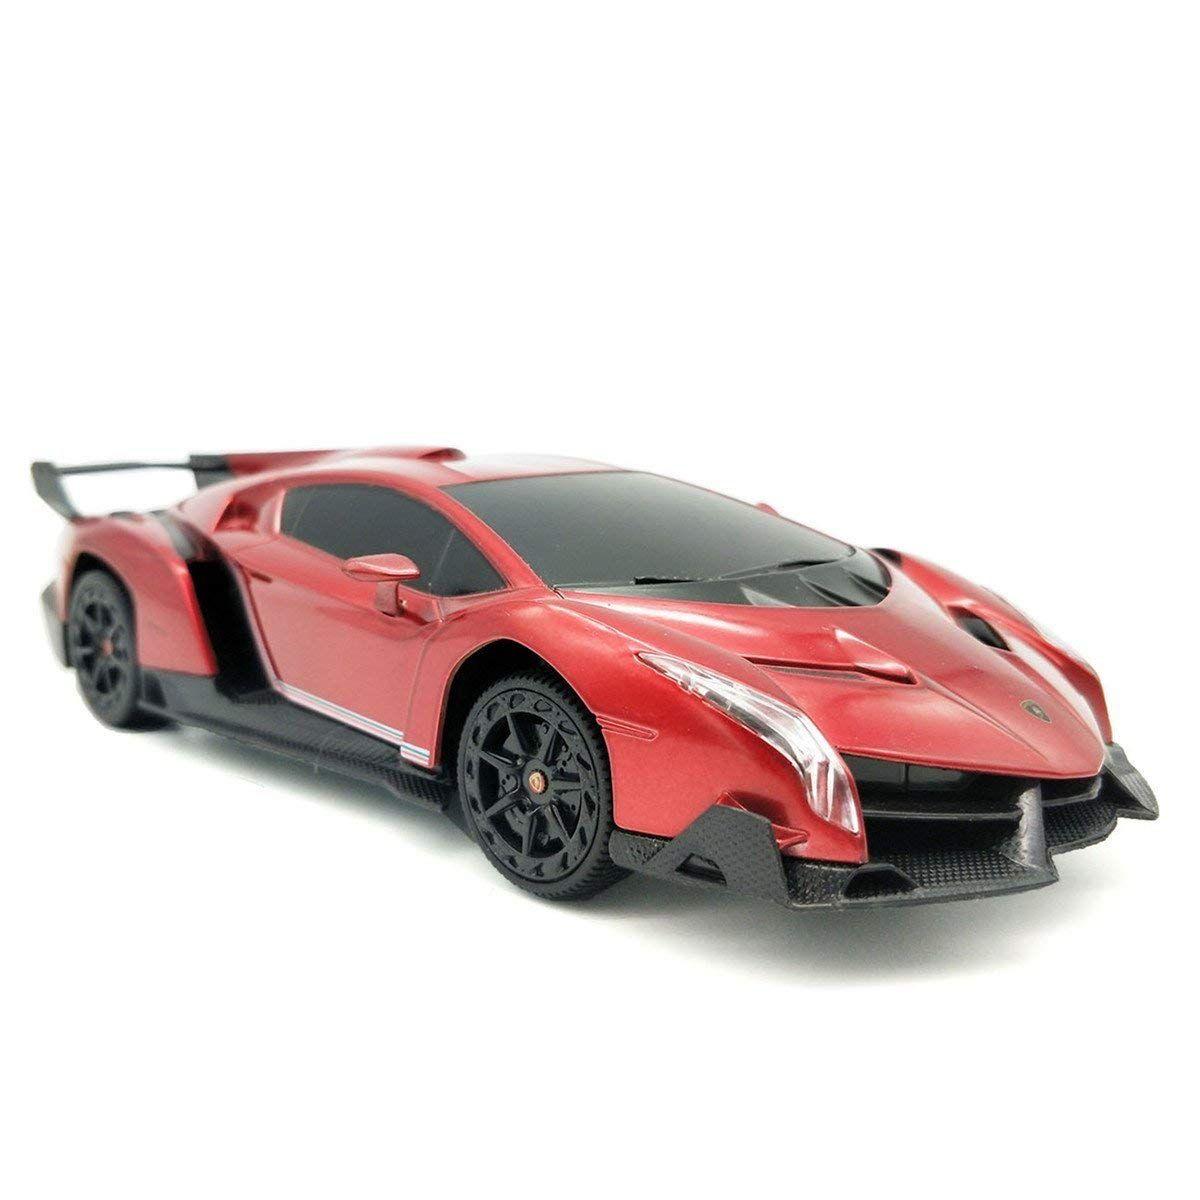 c44ccc92556 50% Off for  7.99 Amazon.com  Remote Control Car-LAFALA Electric RC Car- Lamborghini Veneno Radio Remote Control Vehicle Sport Racing Hobby Grade  Licensed ...